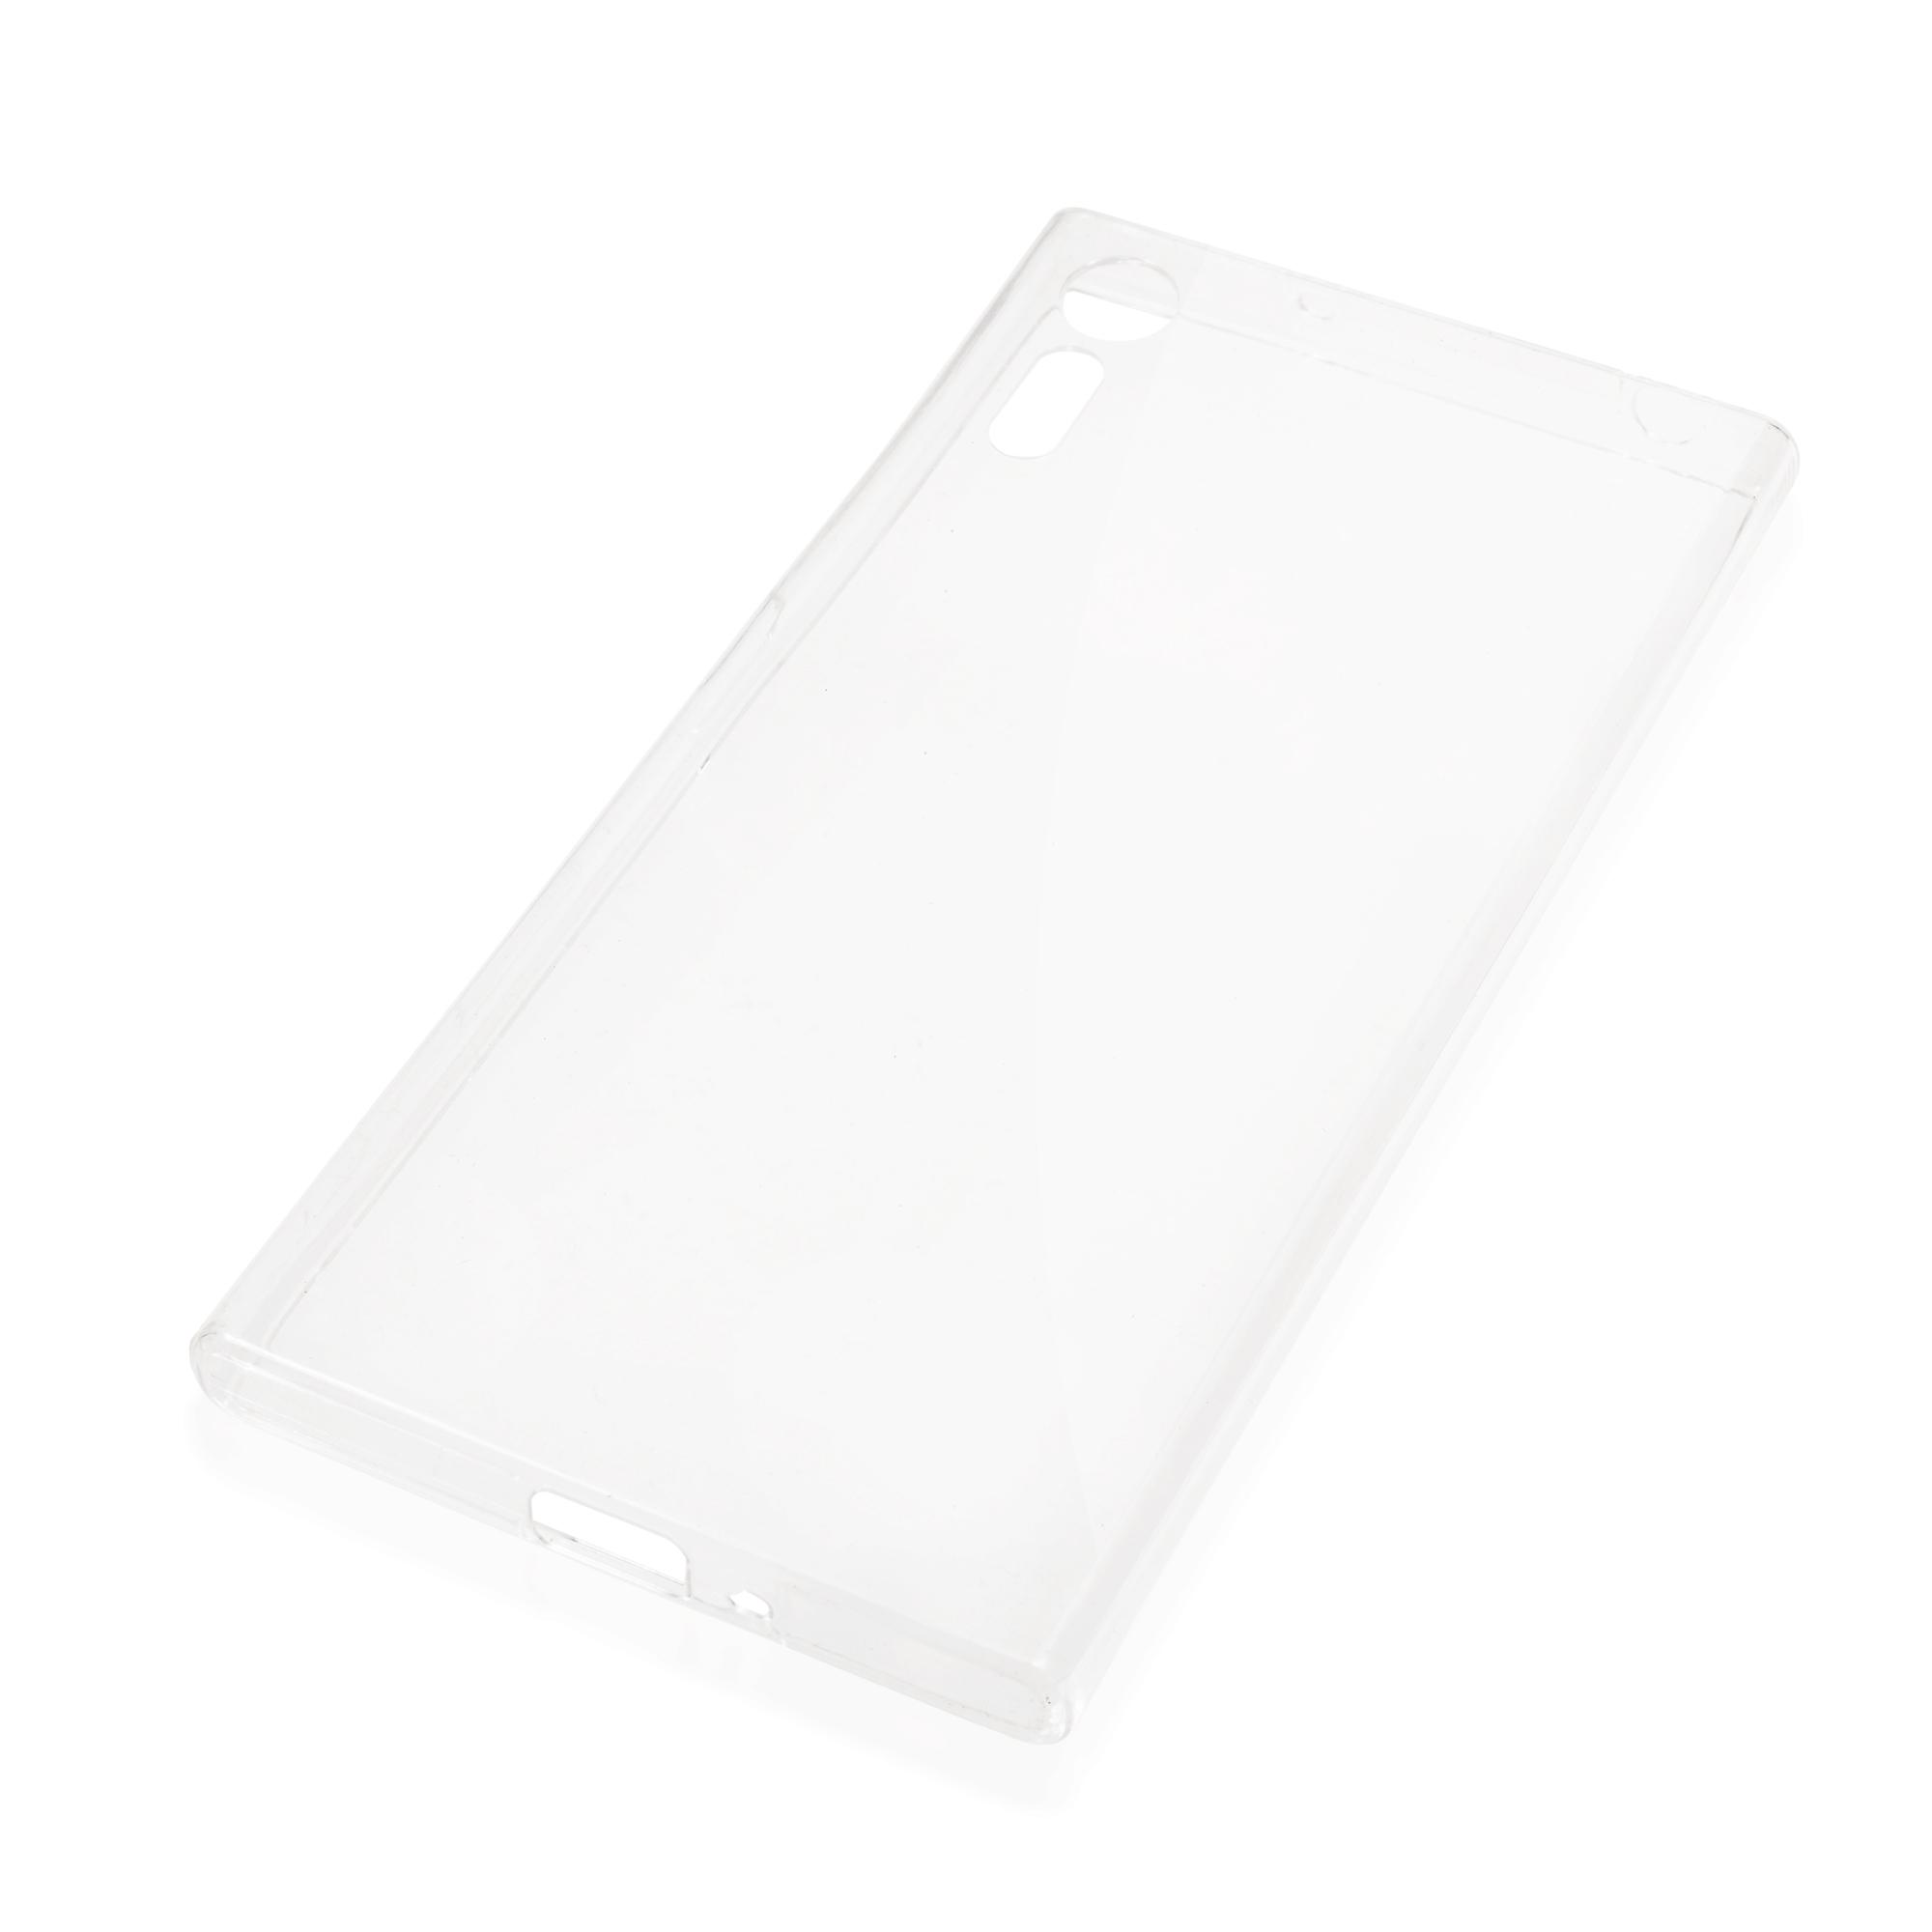 Накладка силиконовая Brosco прозрачная для Xperia XZ